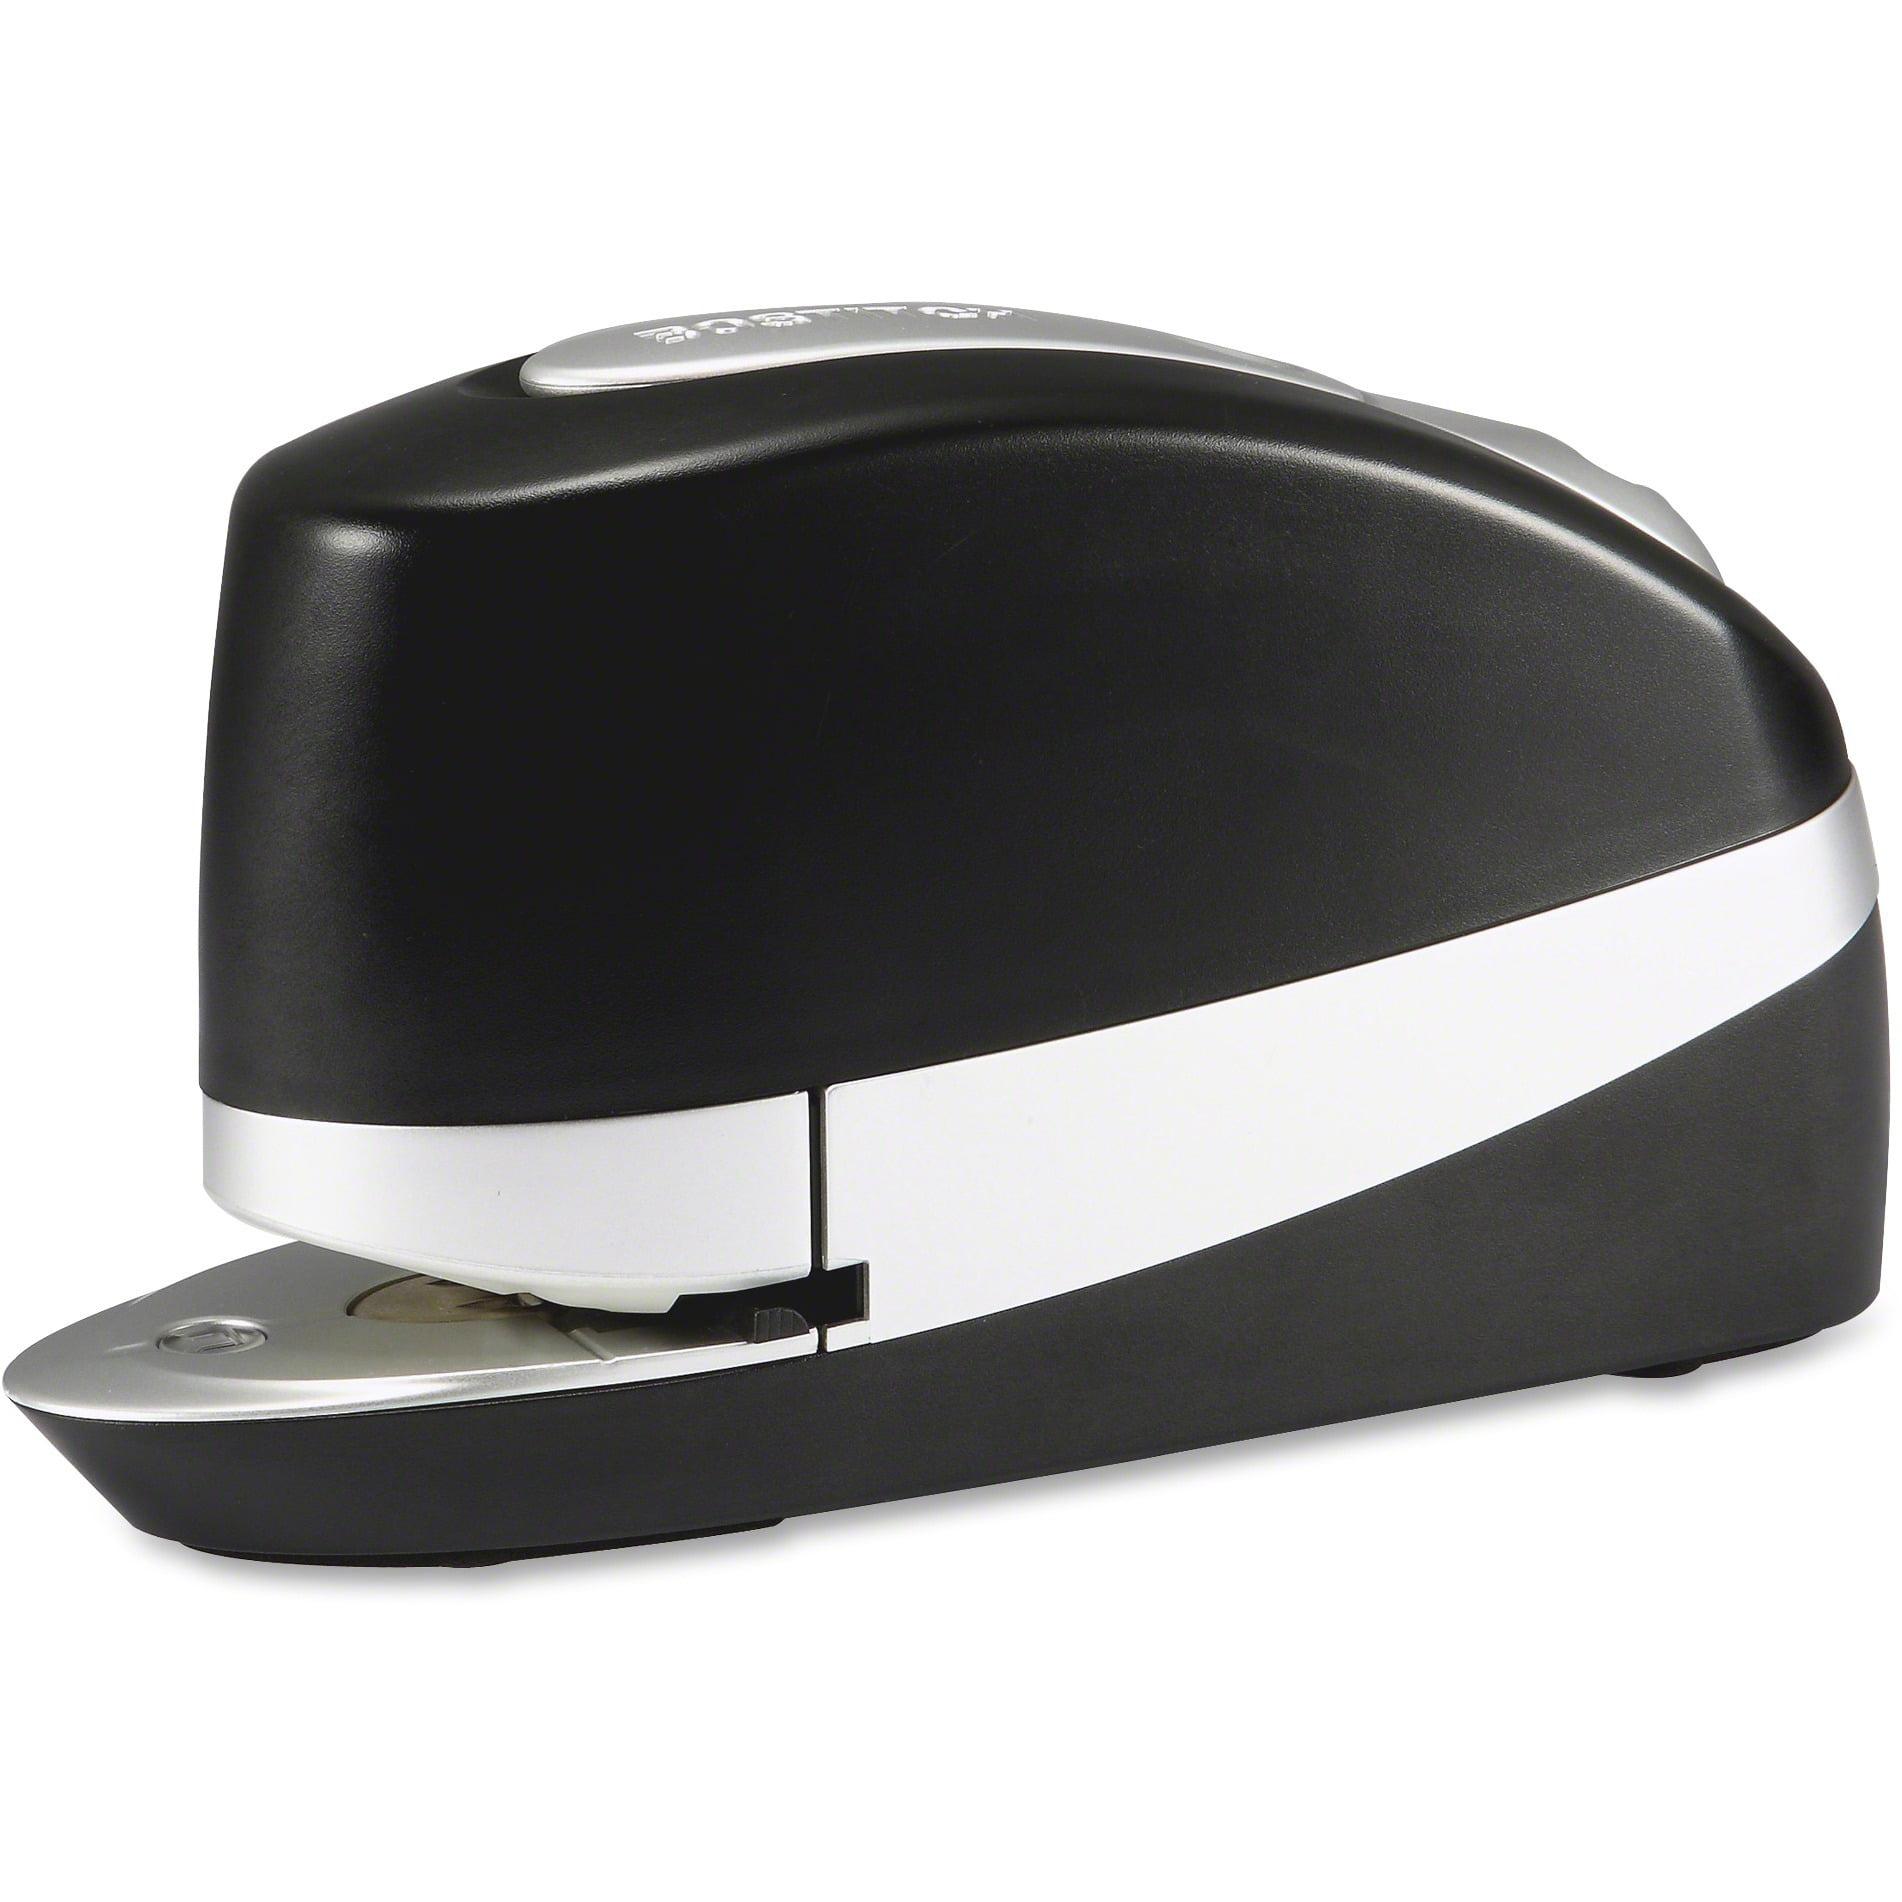 Bostitch, BOS20SUITEBLK, Impulse 20 Executive Electric Stapler, 1 Each, Black,Silver